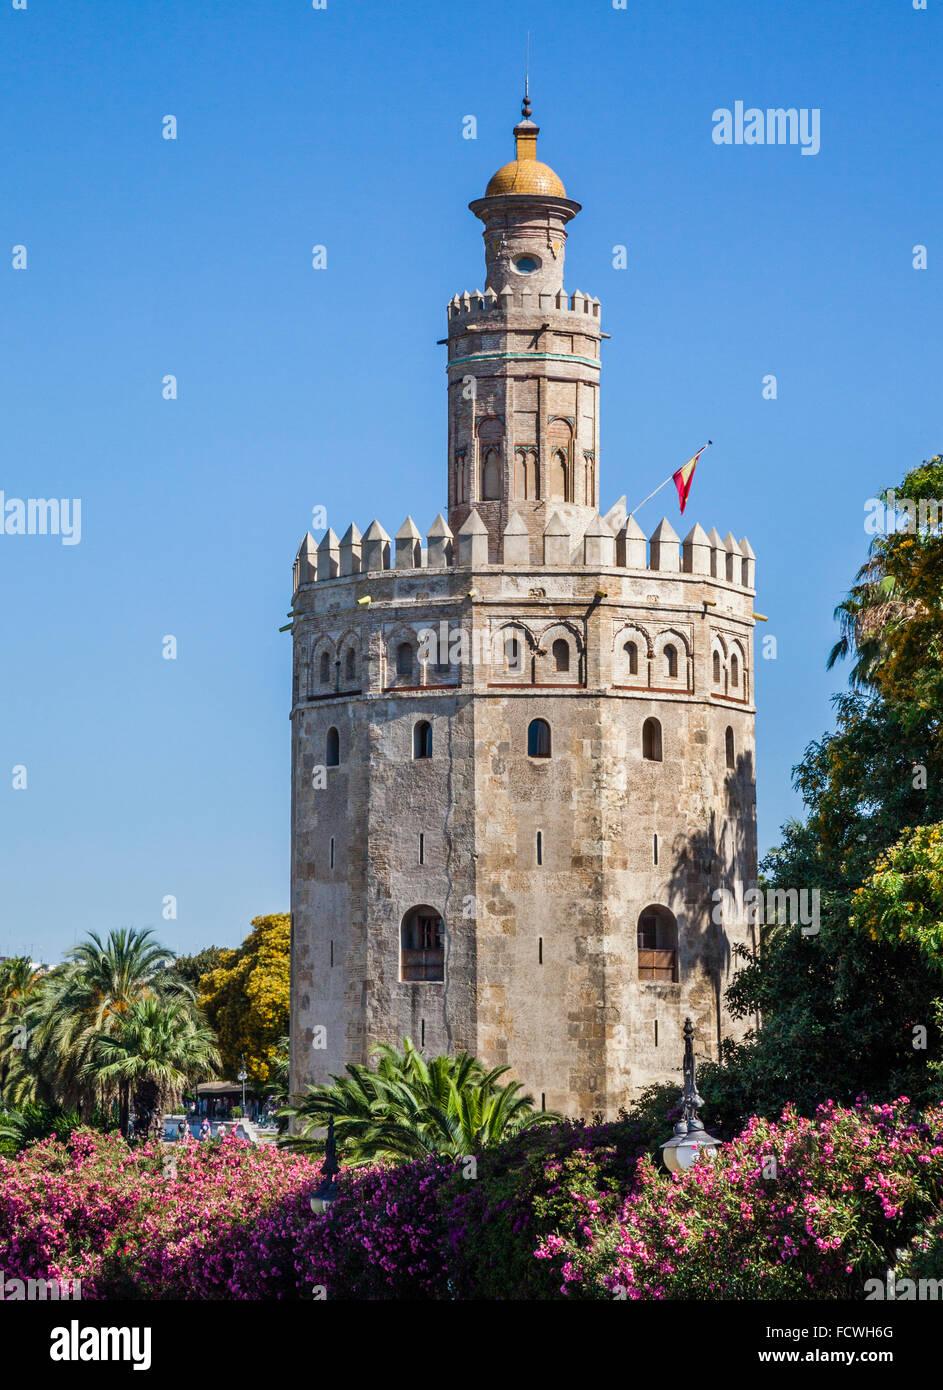 España, Andalucía, provincia de Sevilla, Sevilla, vista de la Torre del Oro, del siglo xiii dodecagonal Imagen De Stock